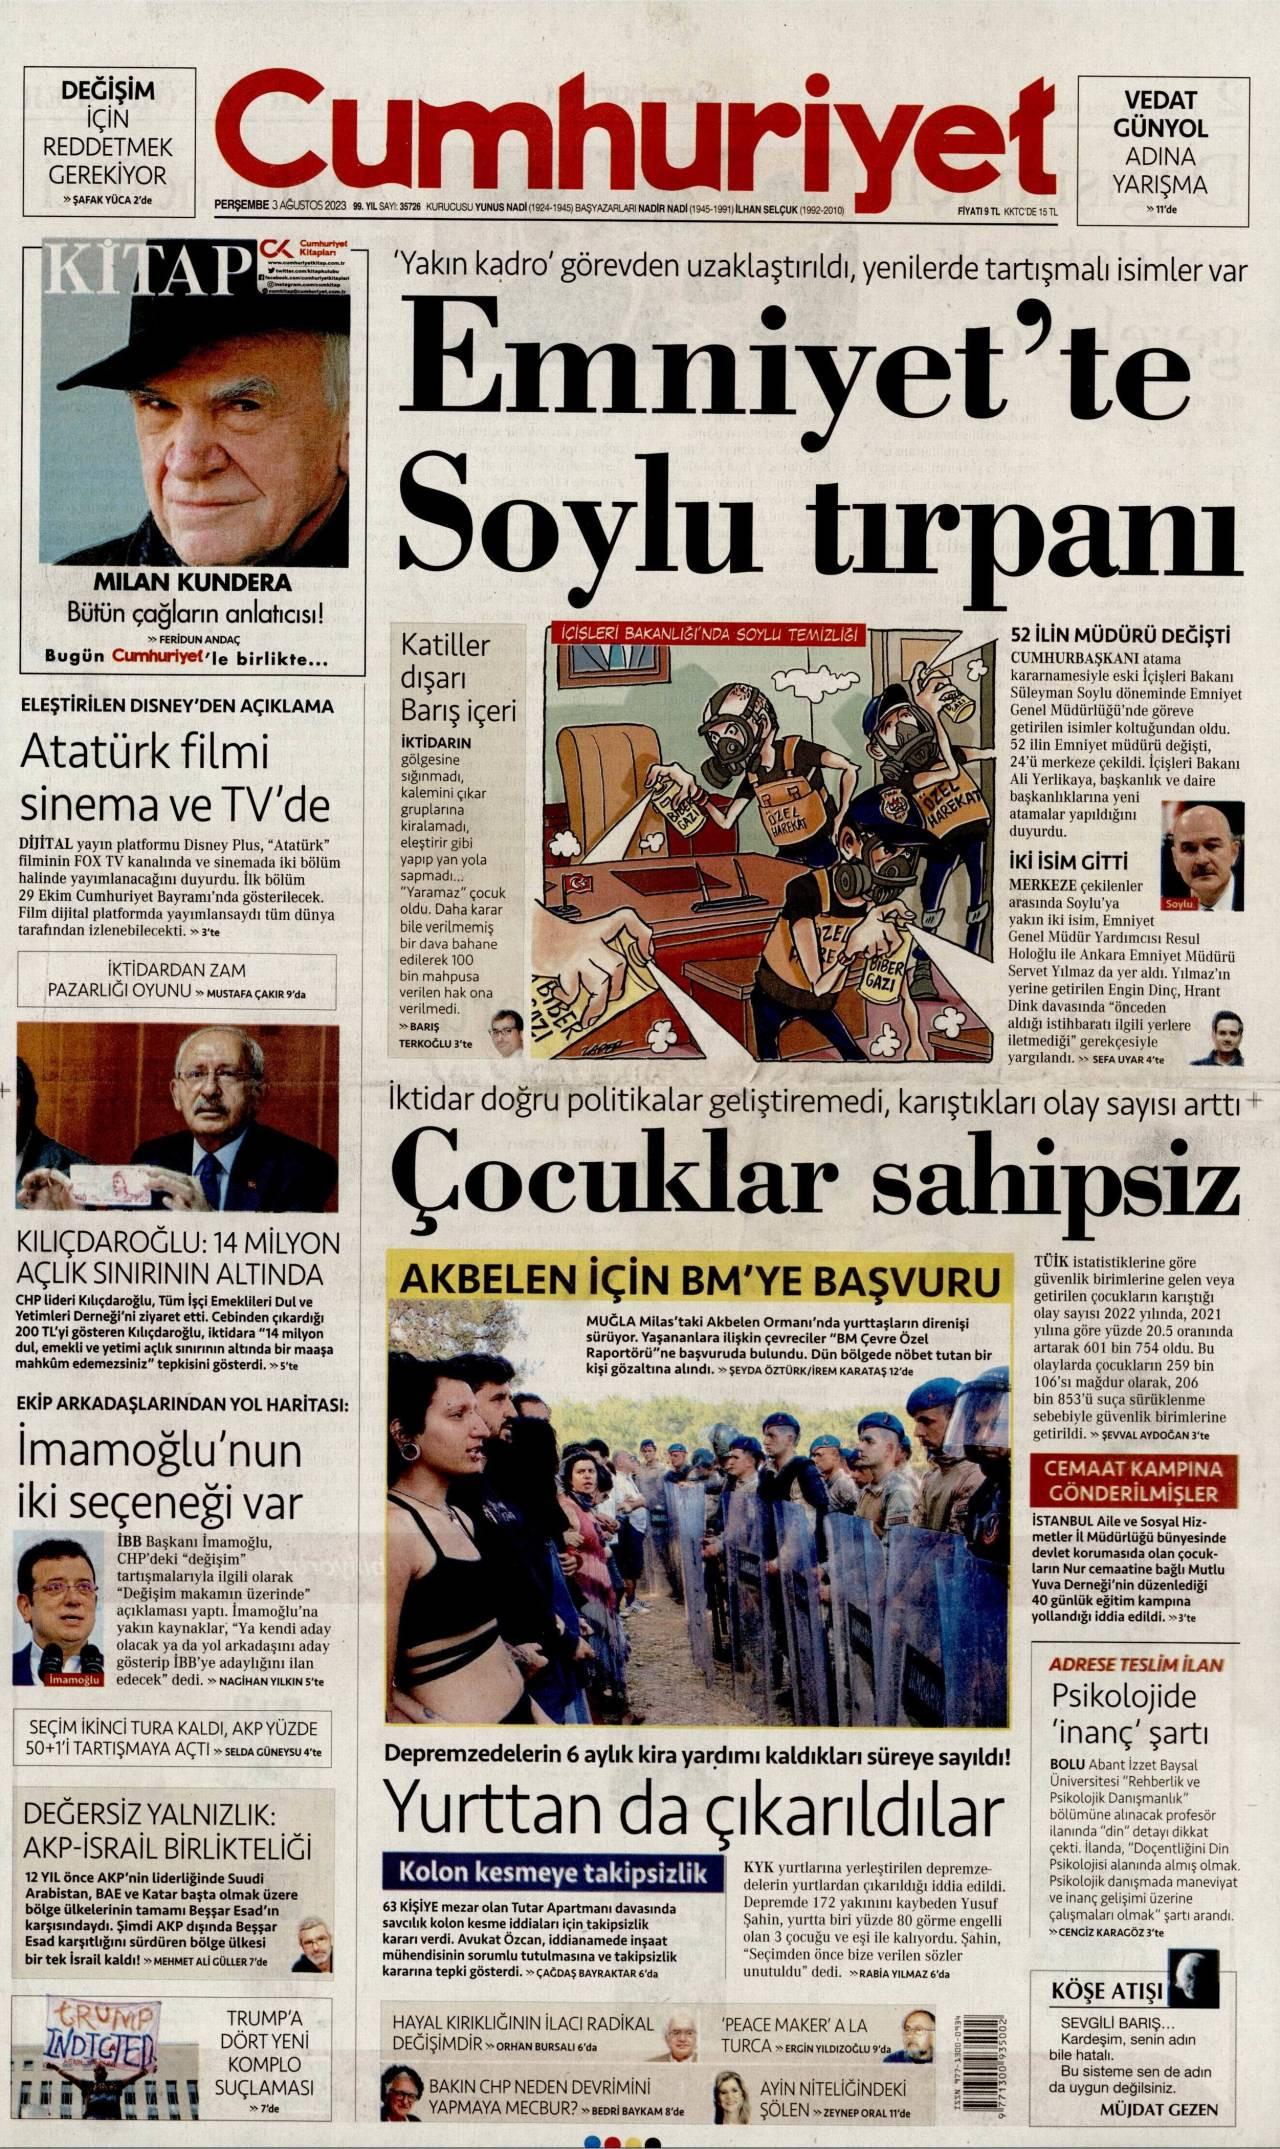 23 Ağustos 2019, Cuma cumhuriyet Gazetesi